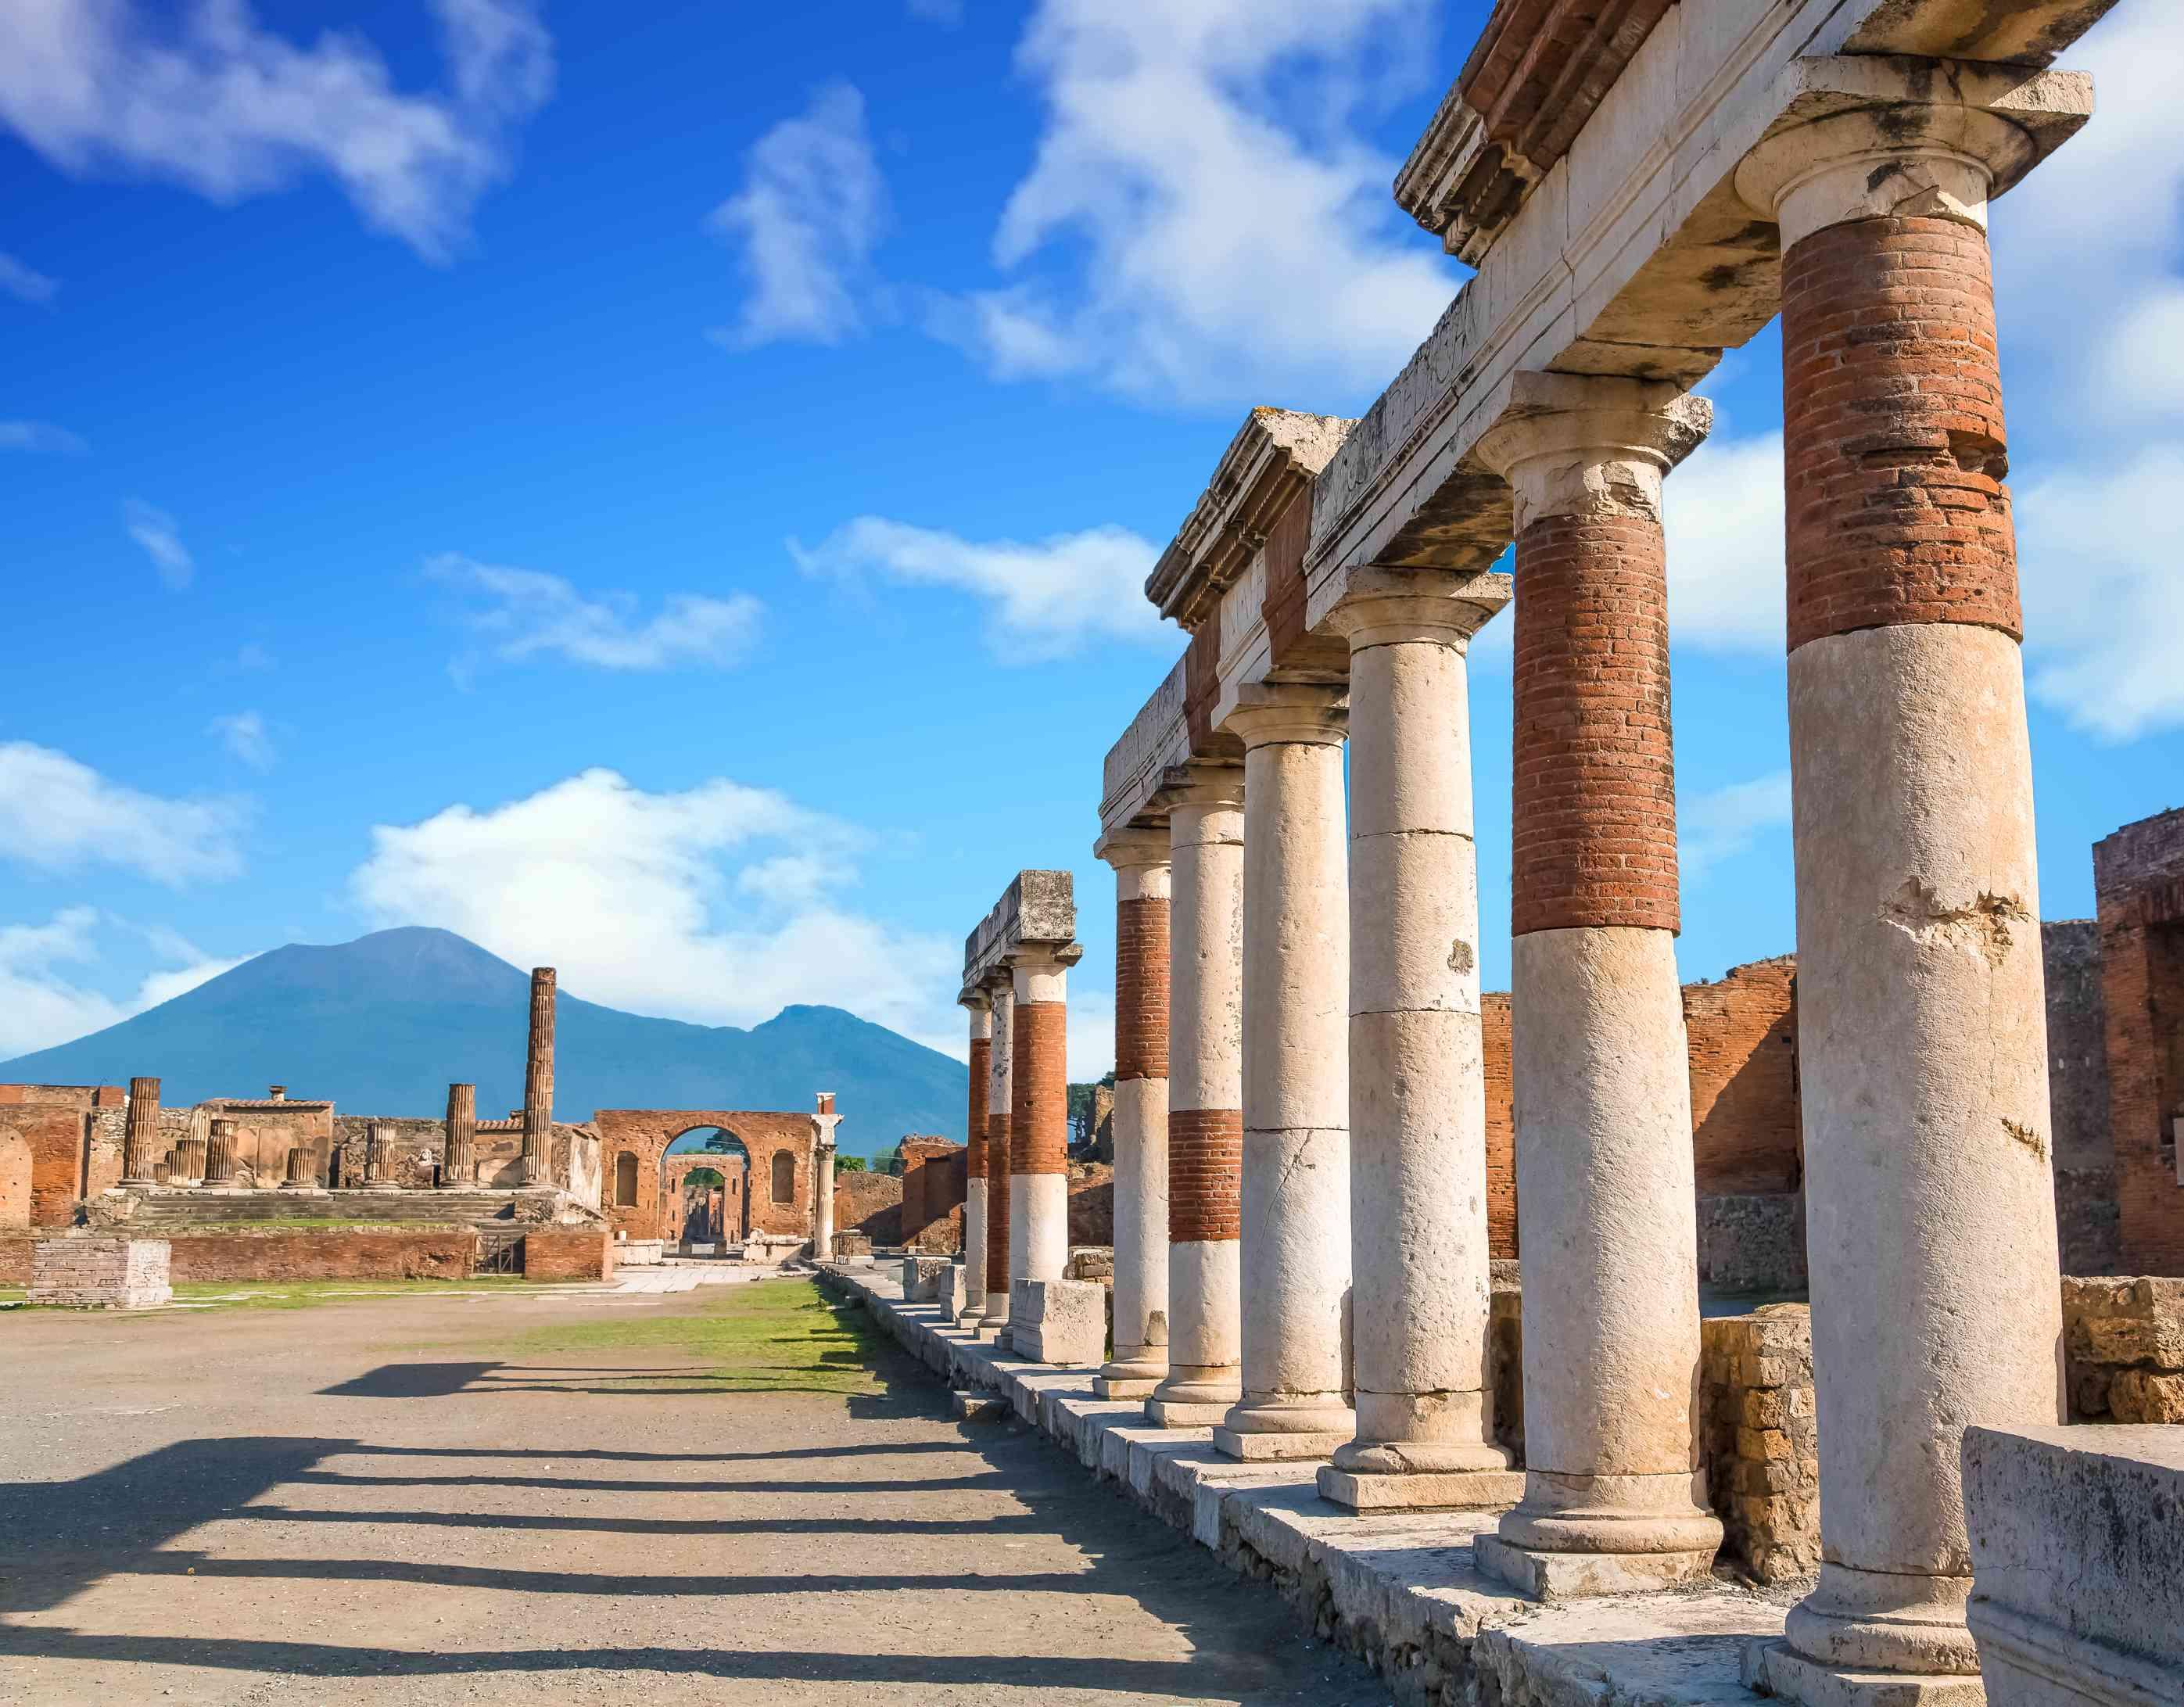 Row of Standing Columns in Pompeii